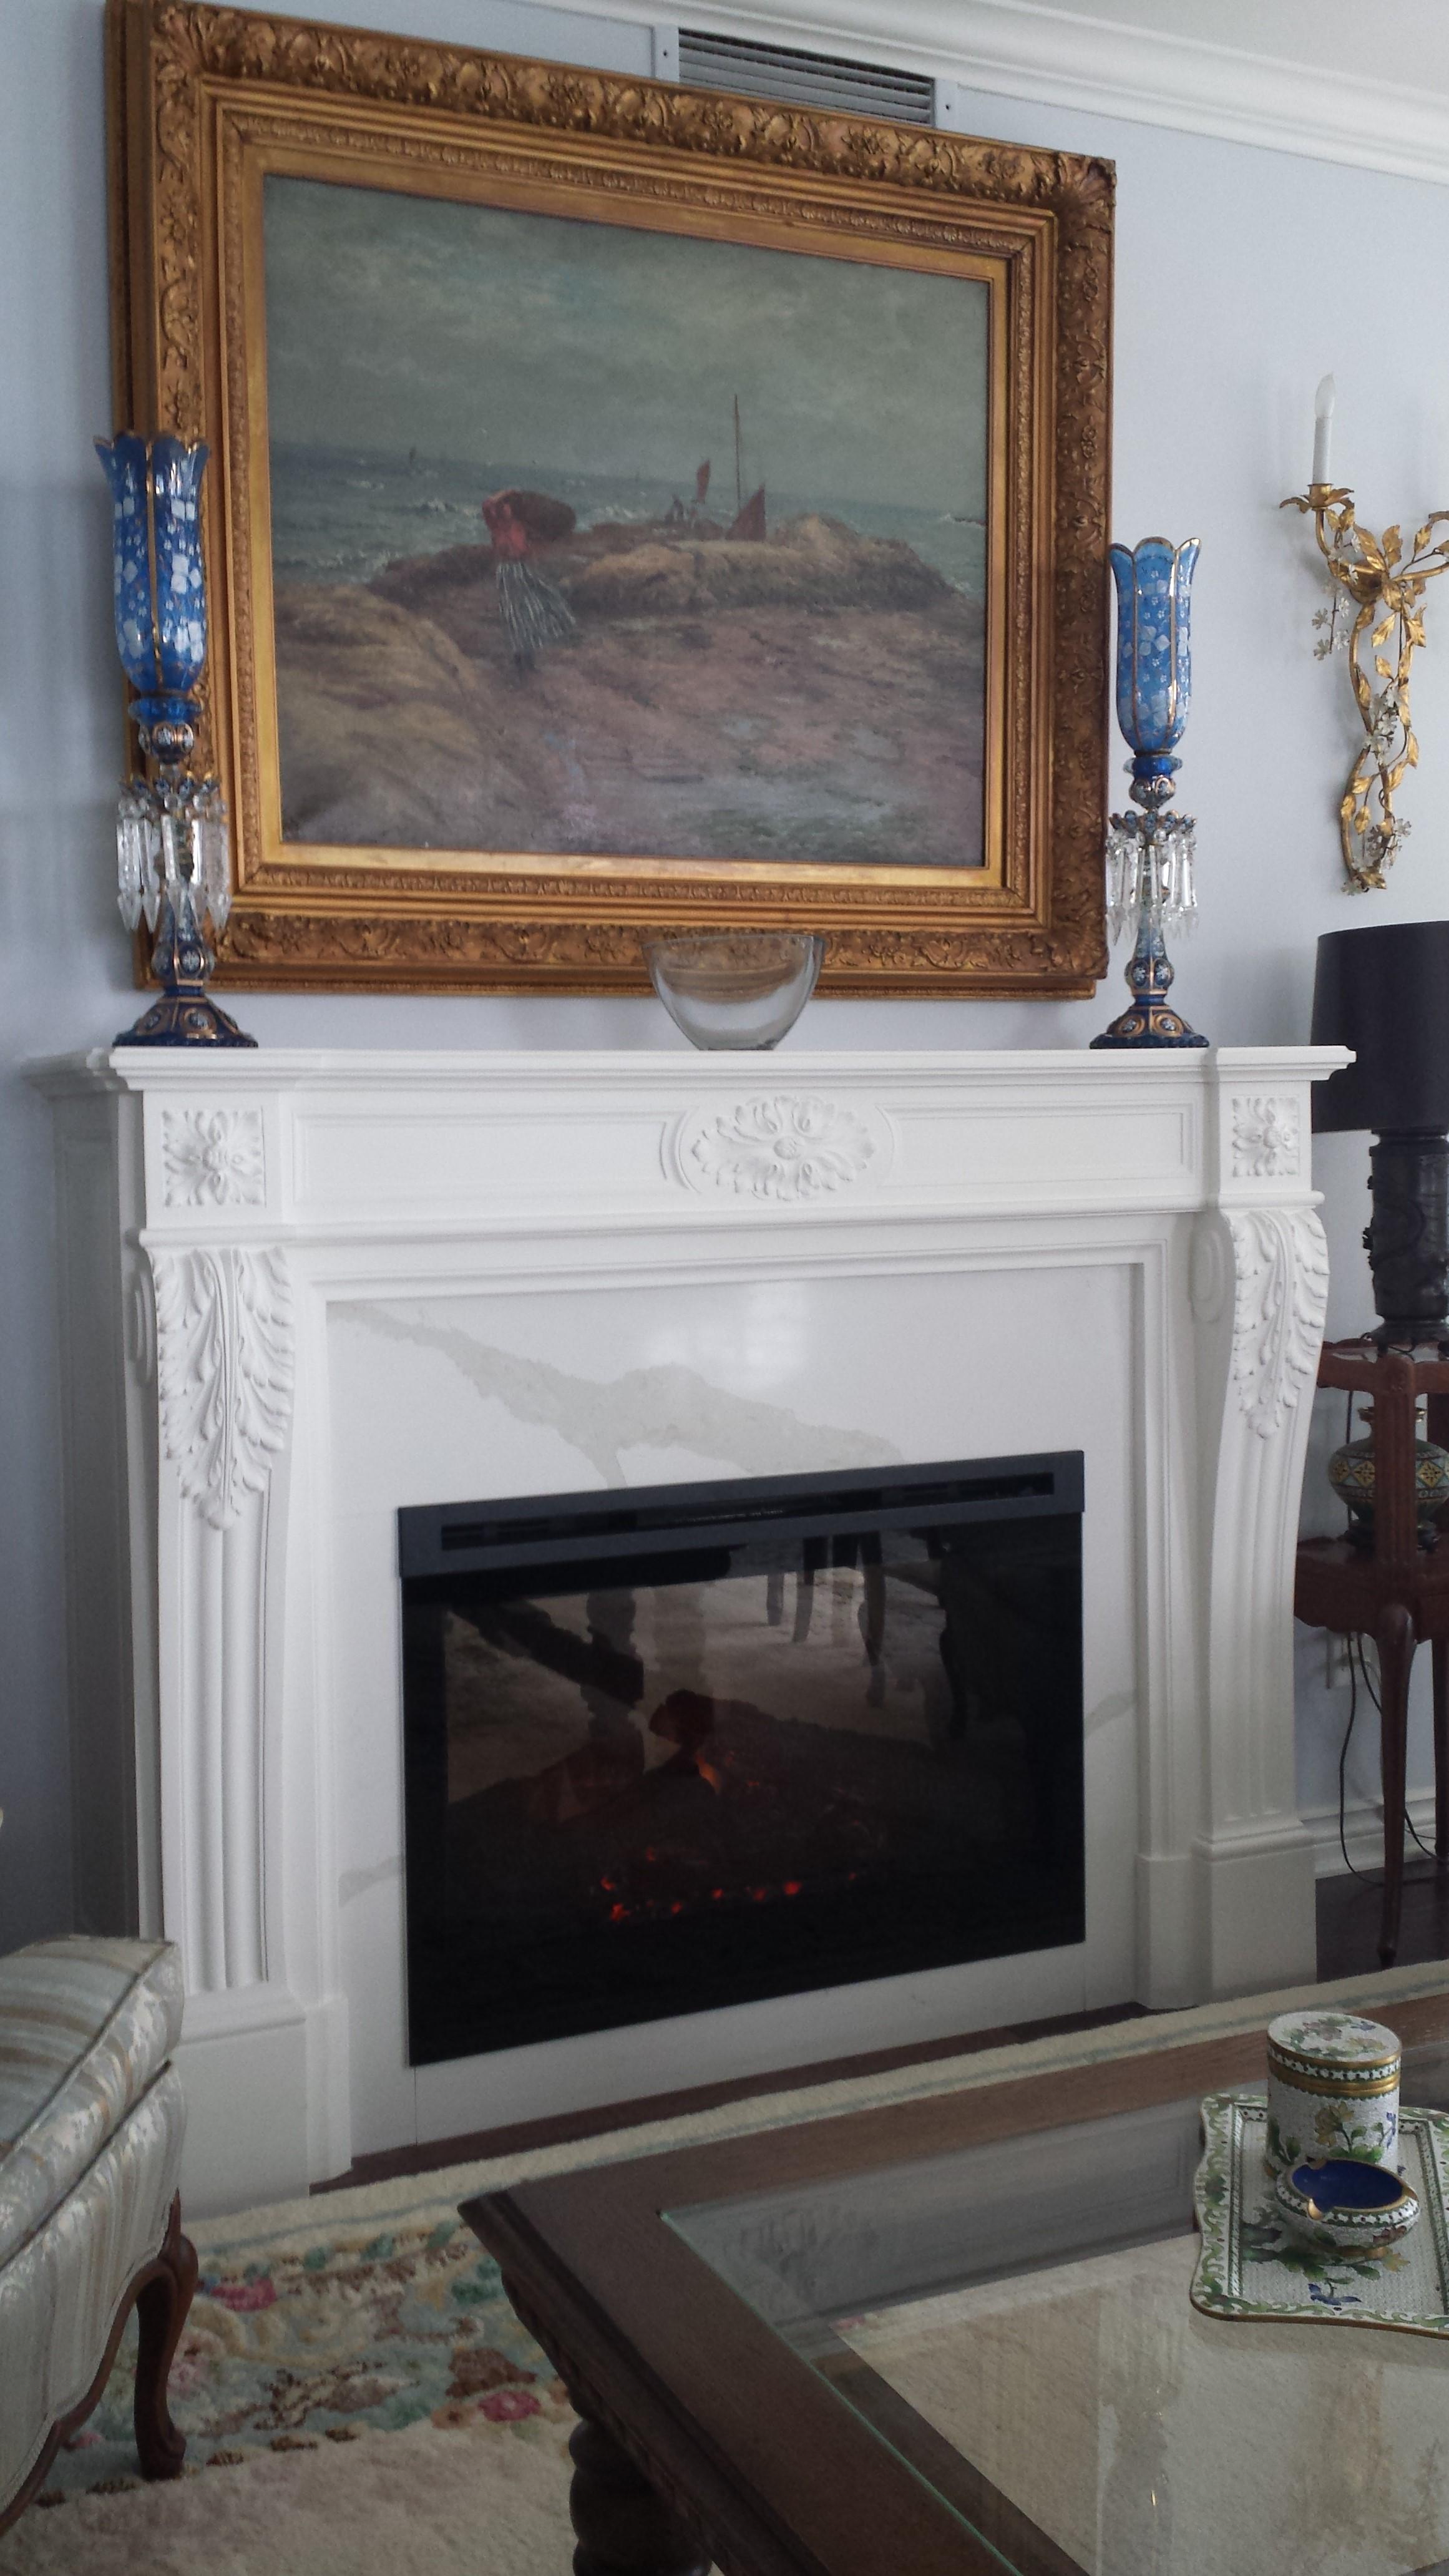 slide mantels furniture hazelmere surrounds fireplace fireplaces mantel